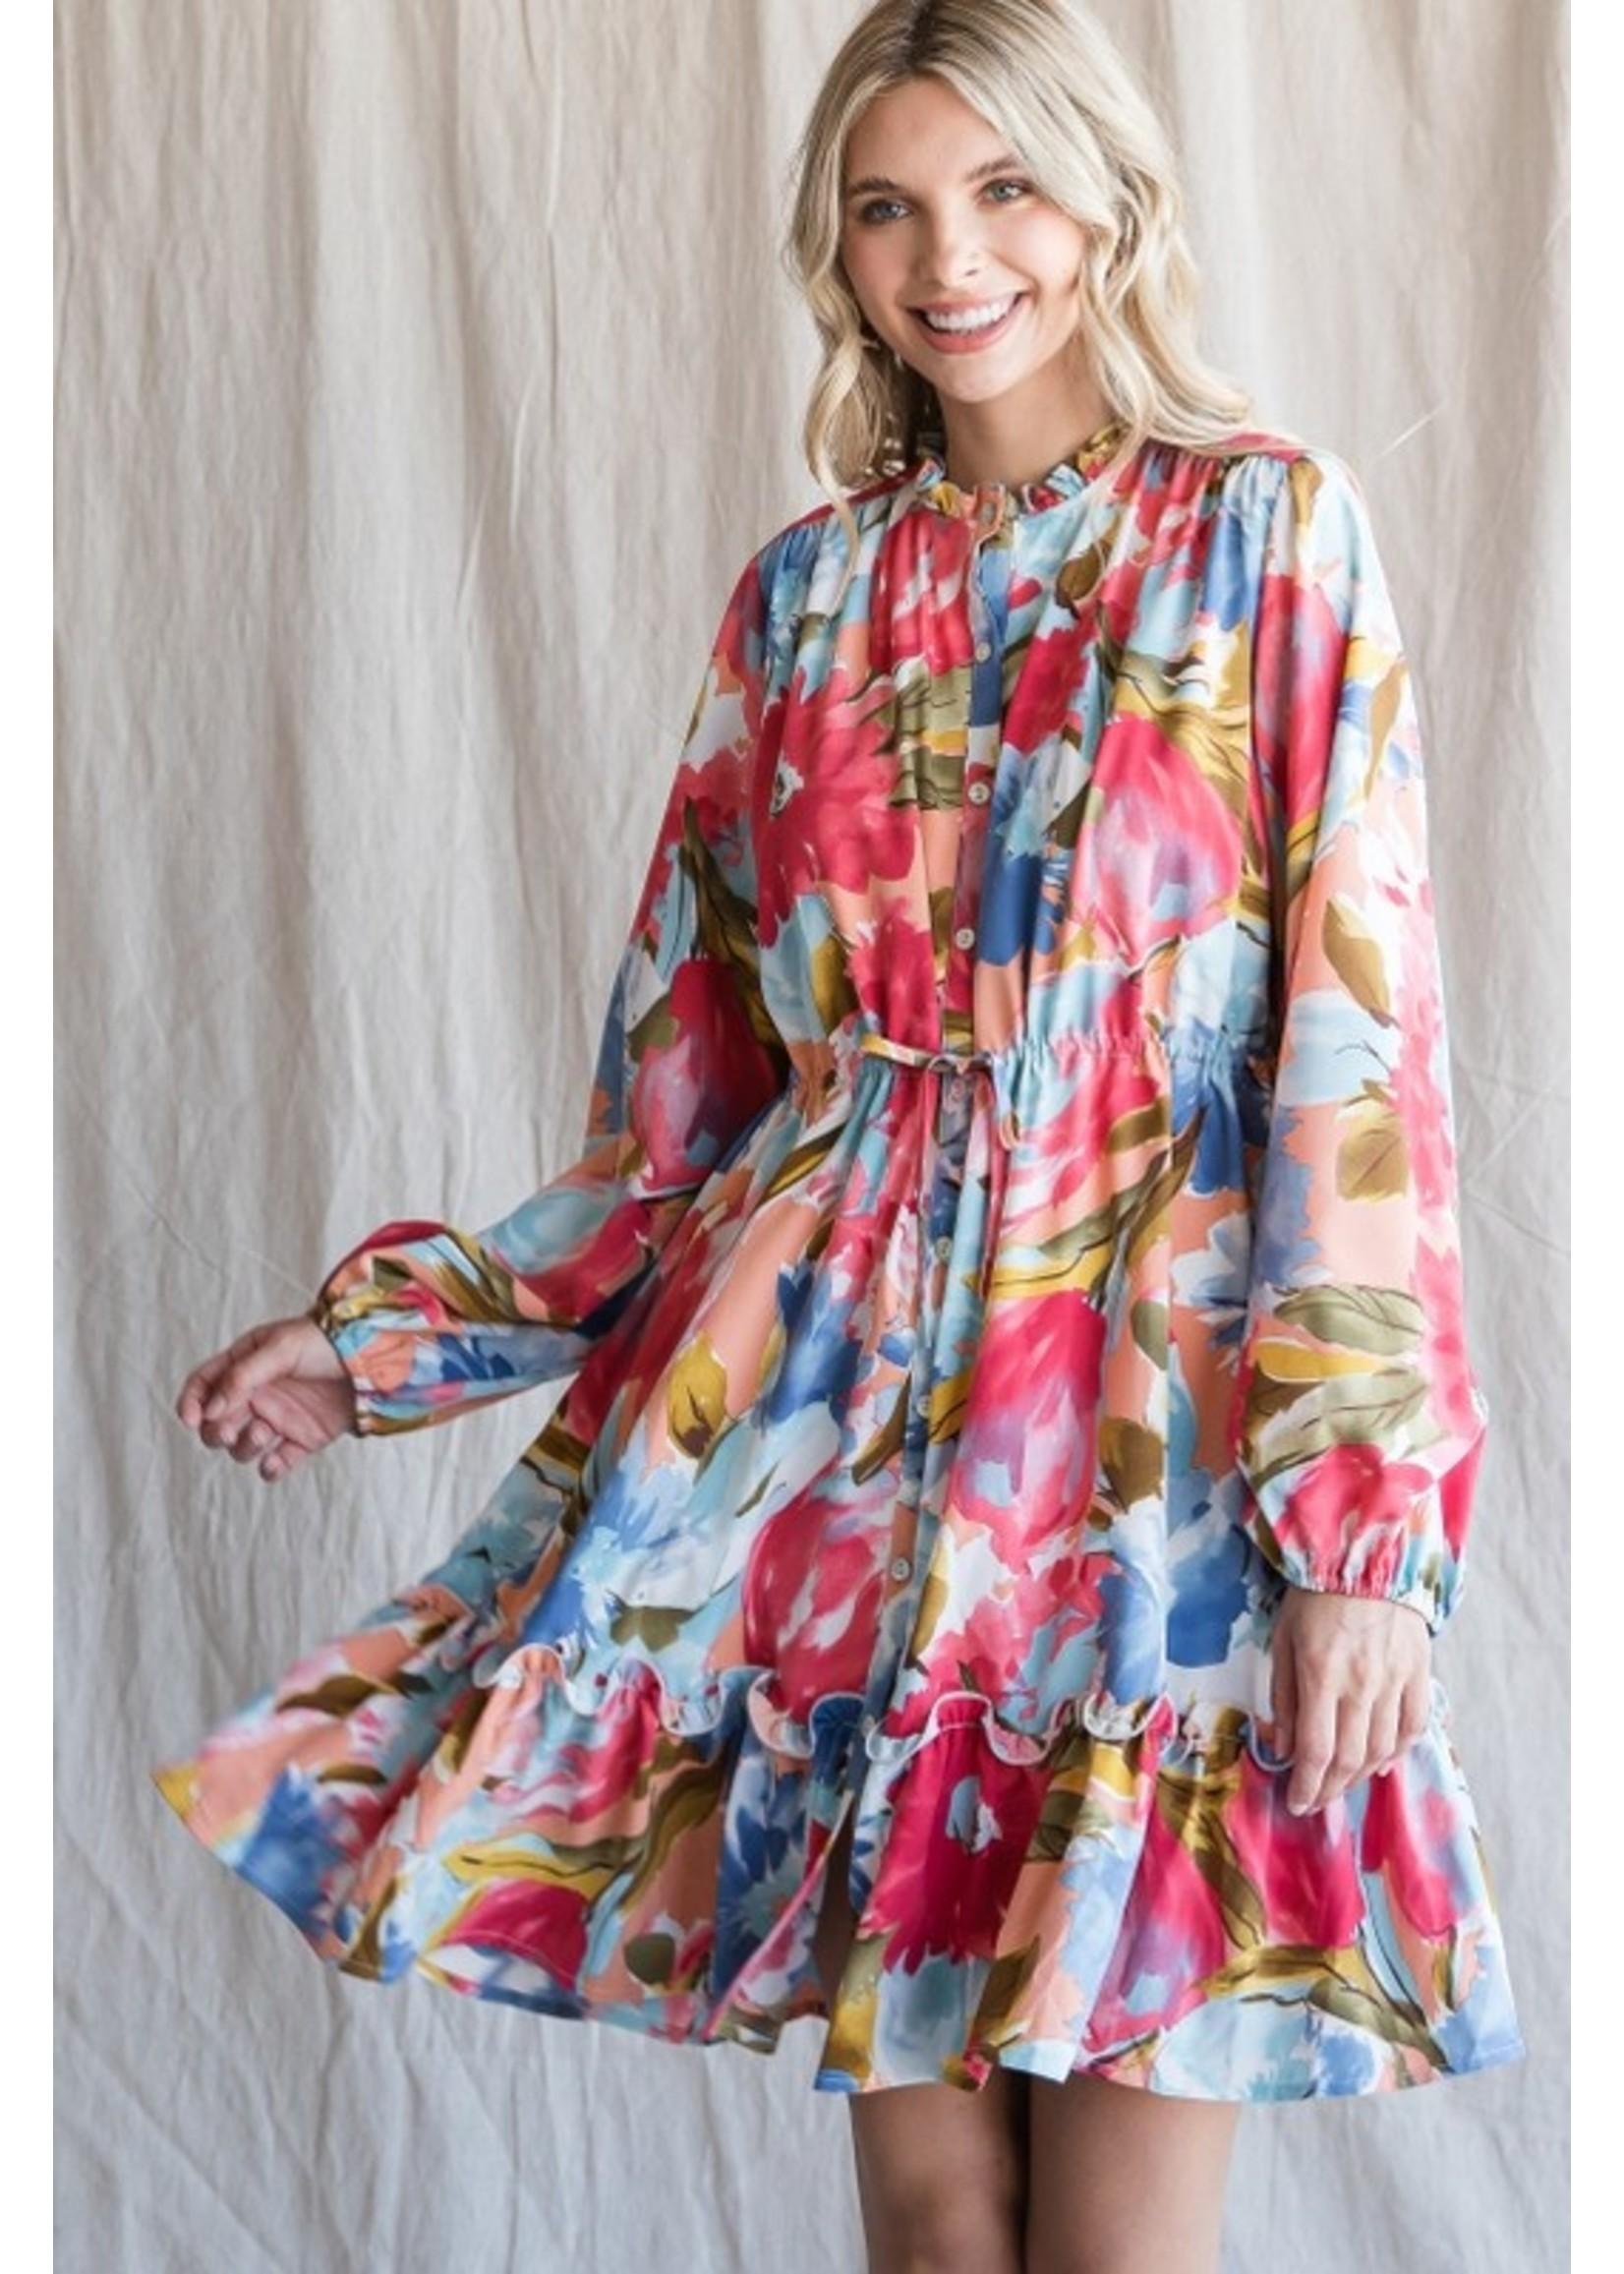 Jodifl Floral Print Button Up Drawstring Dress